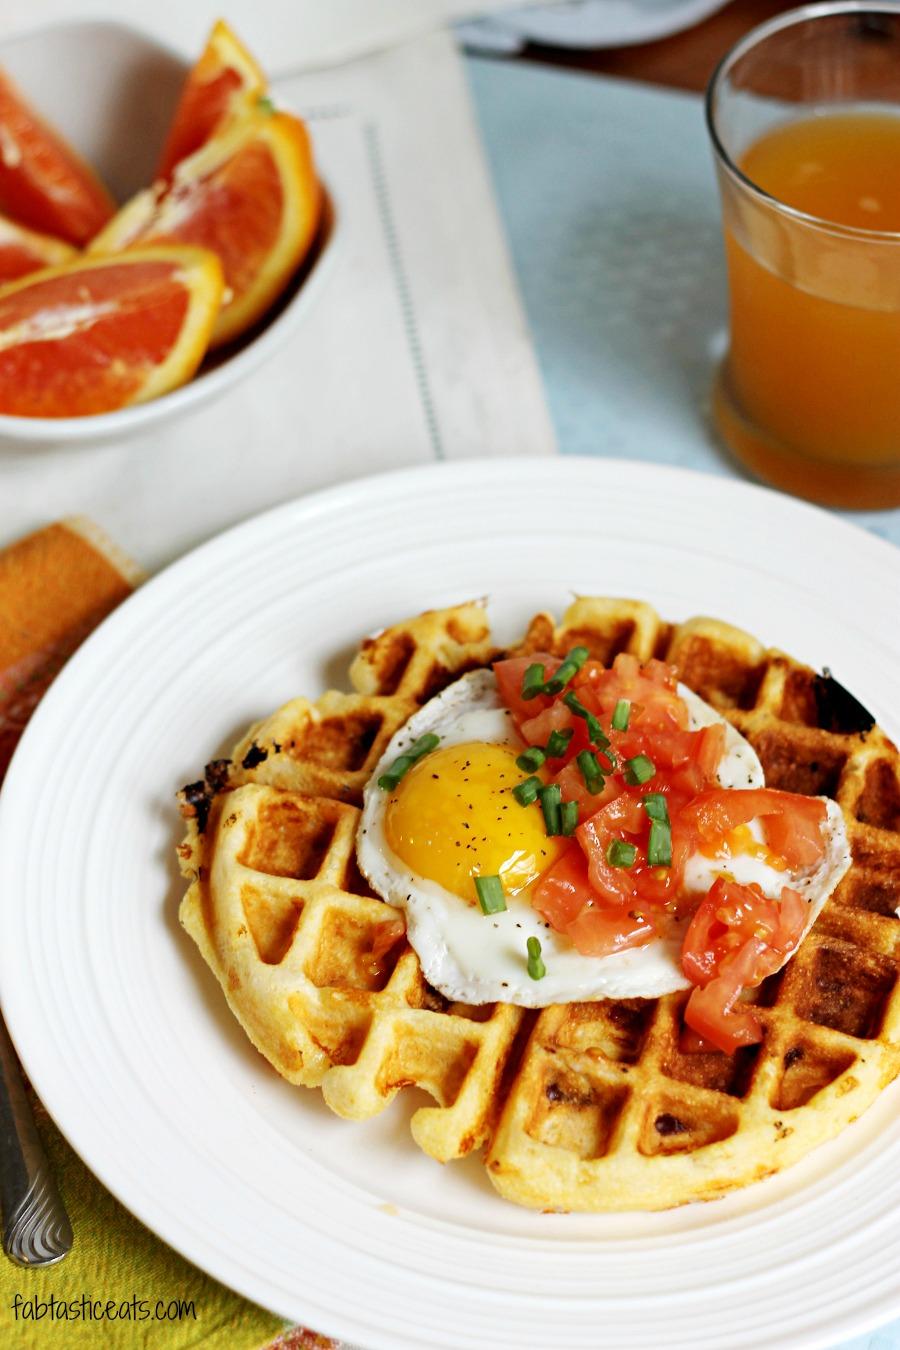 Cheddar Cornmeal Waffles with Eggs | Fabtastic Eats